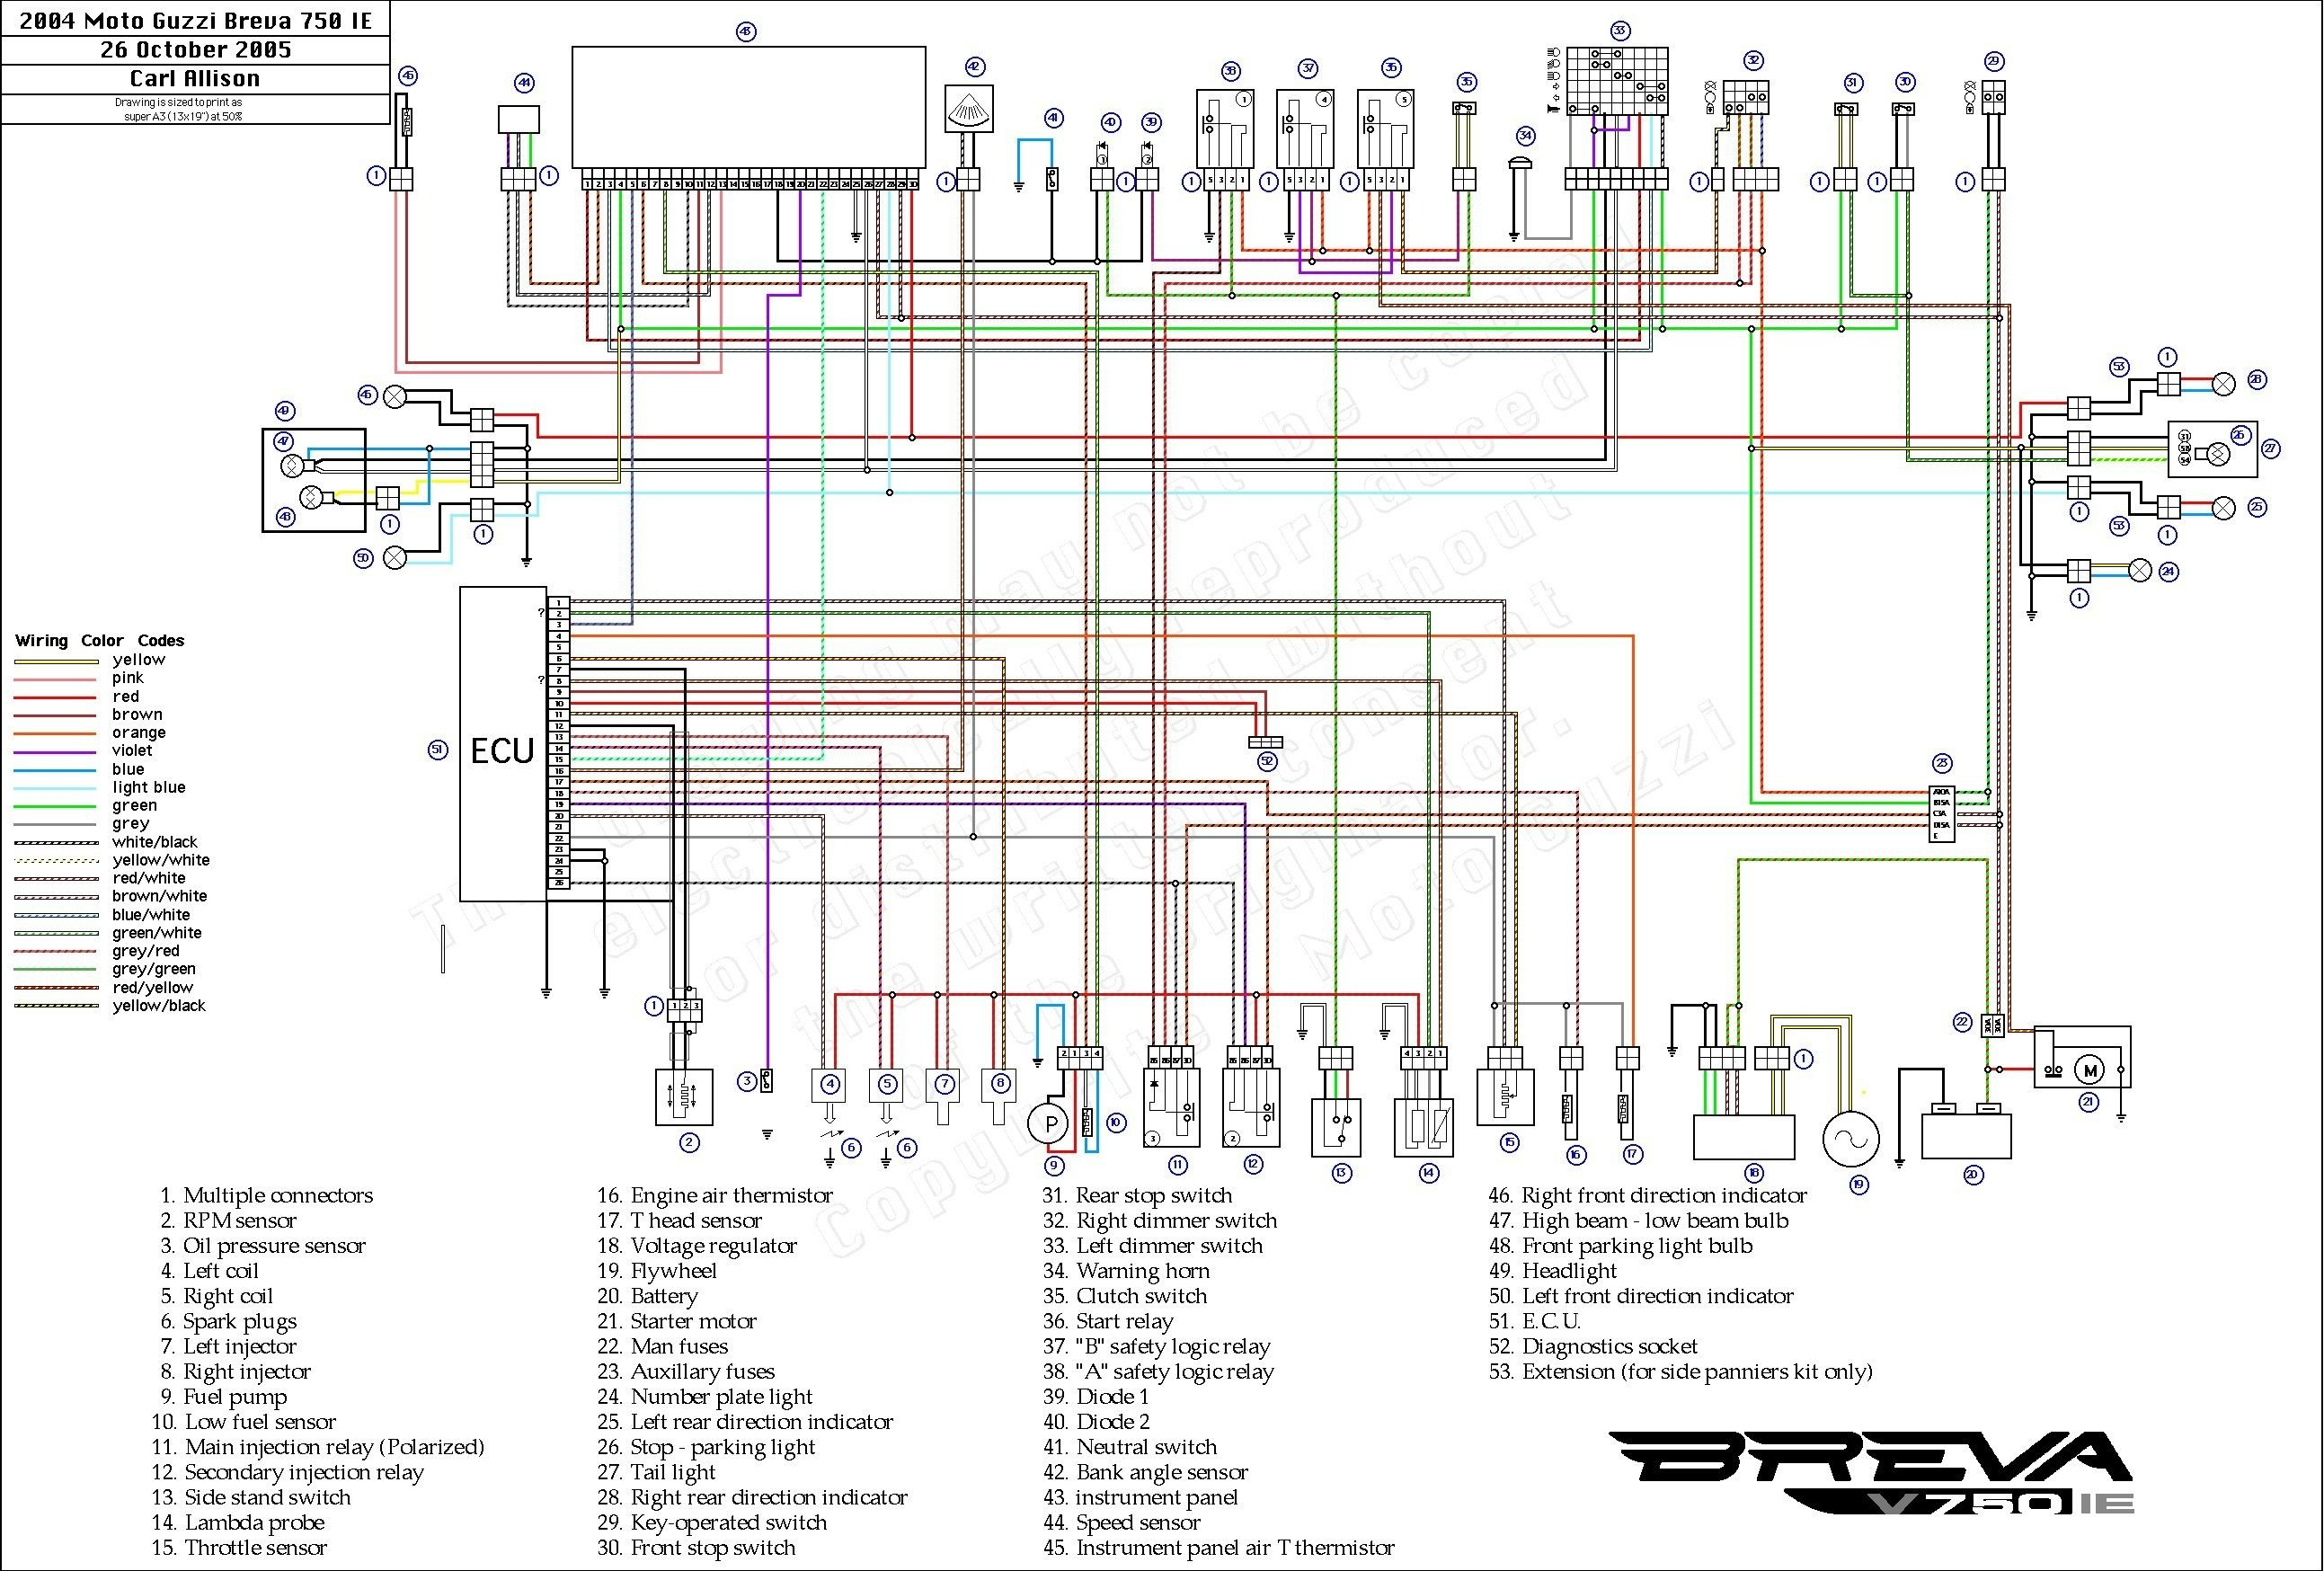 2006 5 7 Hemi Wiring Harness Diagram In 2021 Dodge Ram 1500 Dodge Ram Dodge